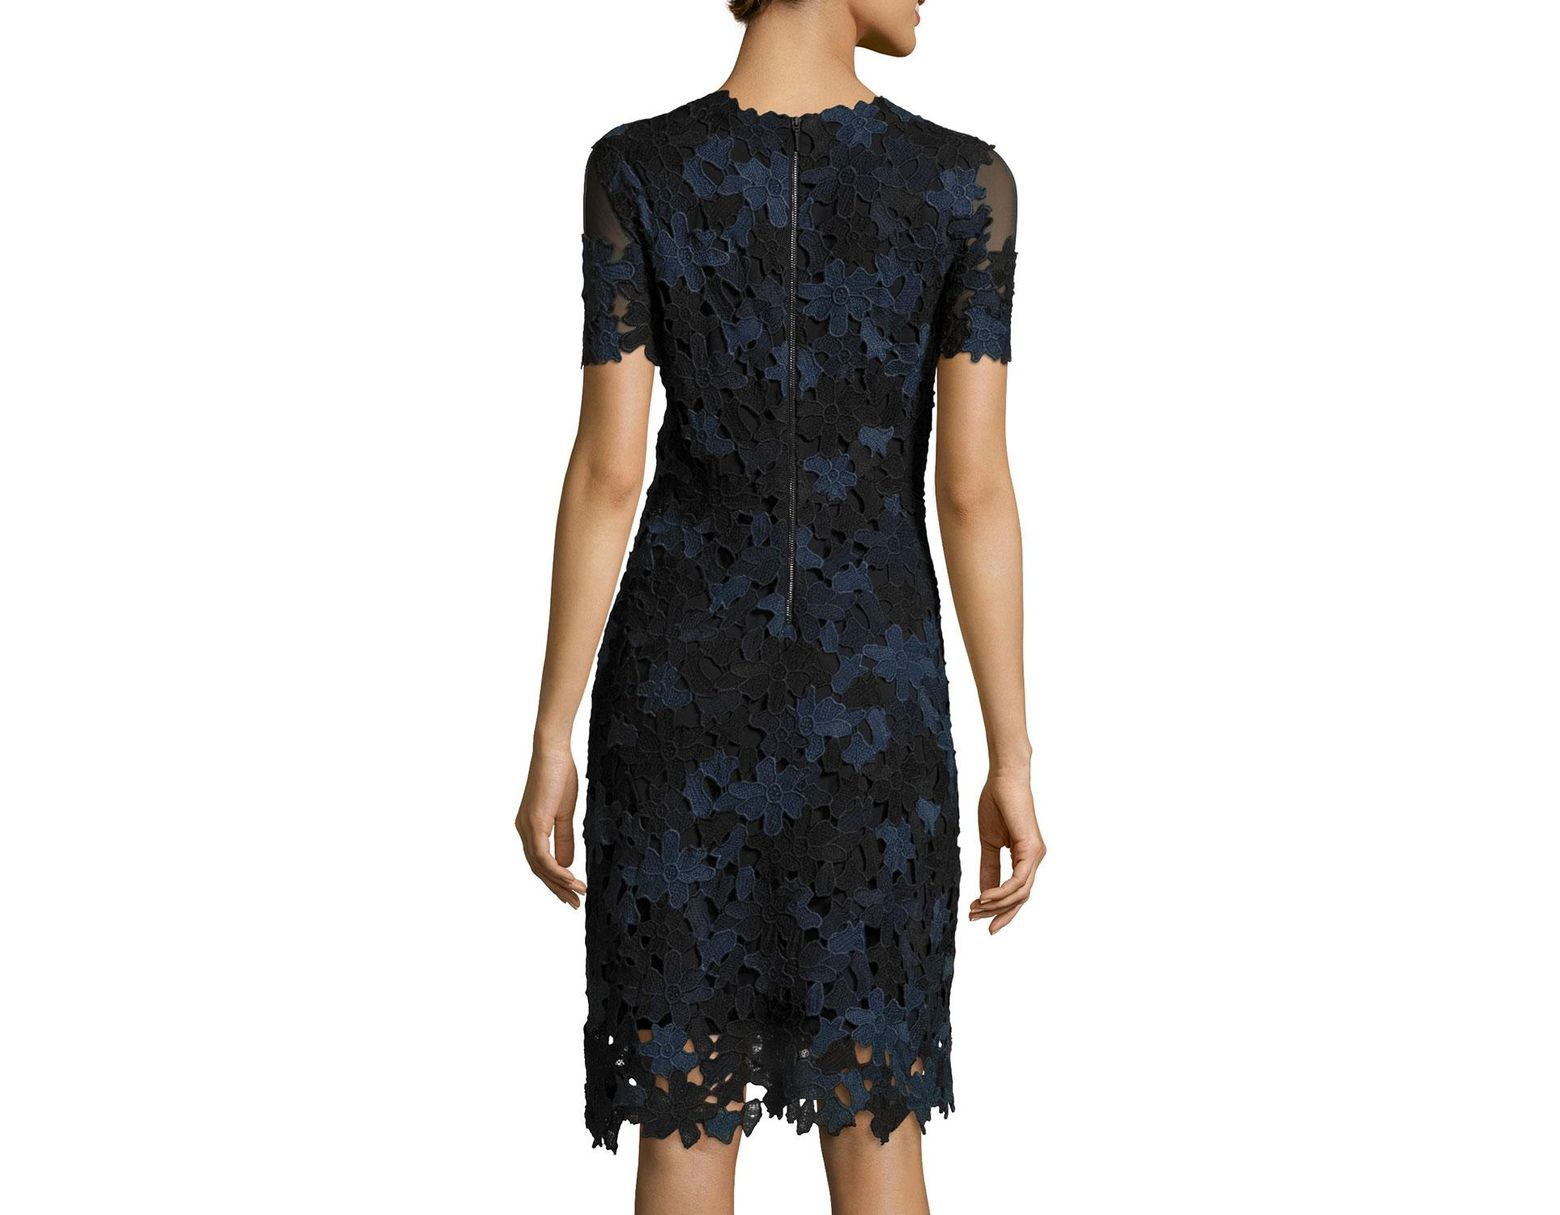 aafe3080ada1 Elie Tahari Ophelia Short-sleeve Lace Sheath Dress in Blue - Save 54% - Lyst